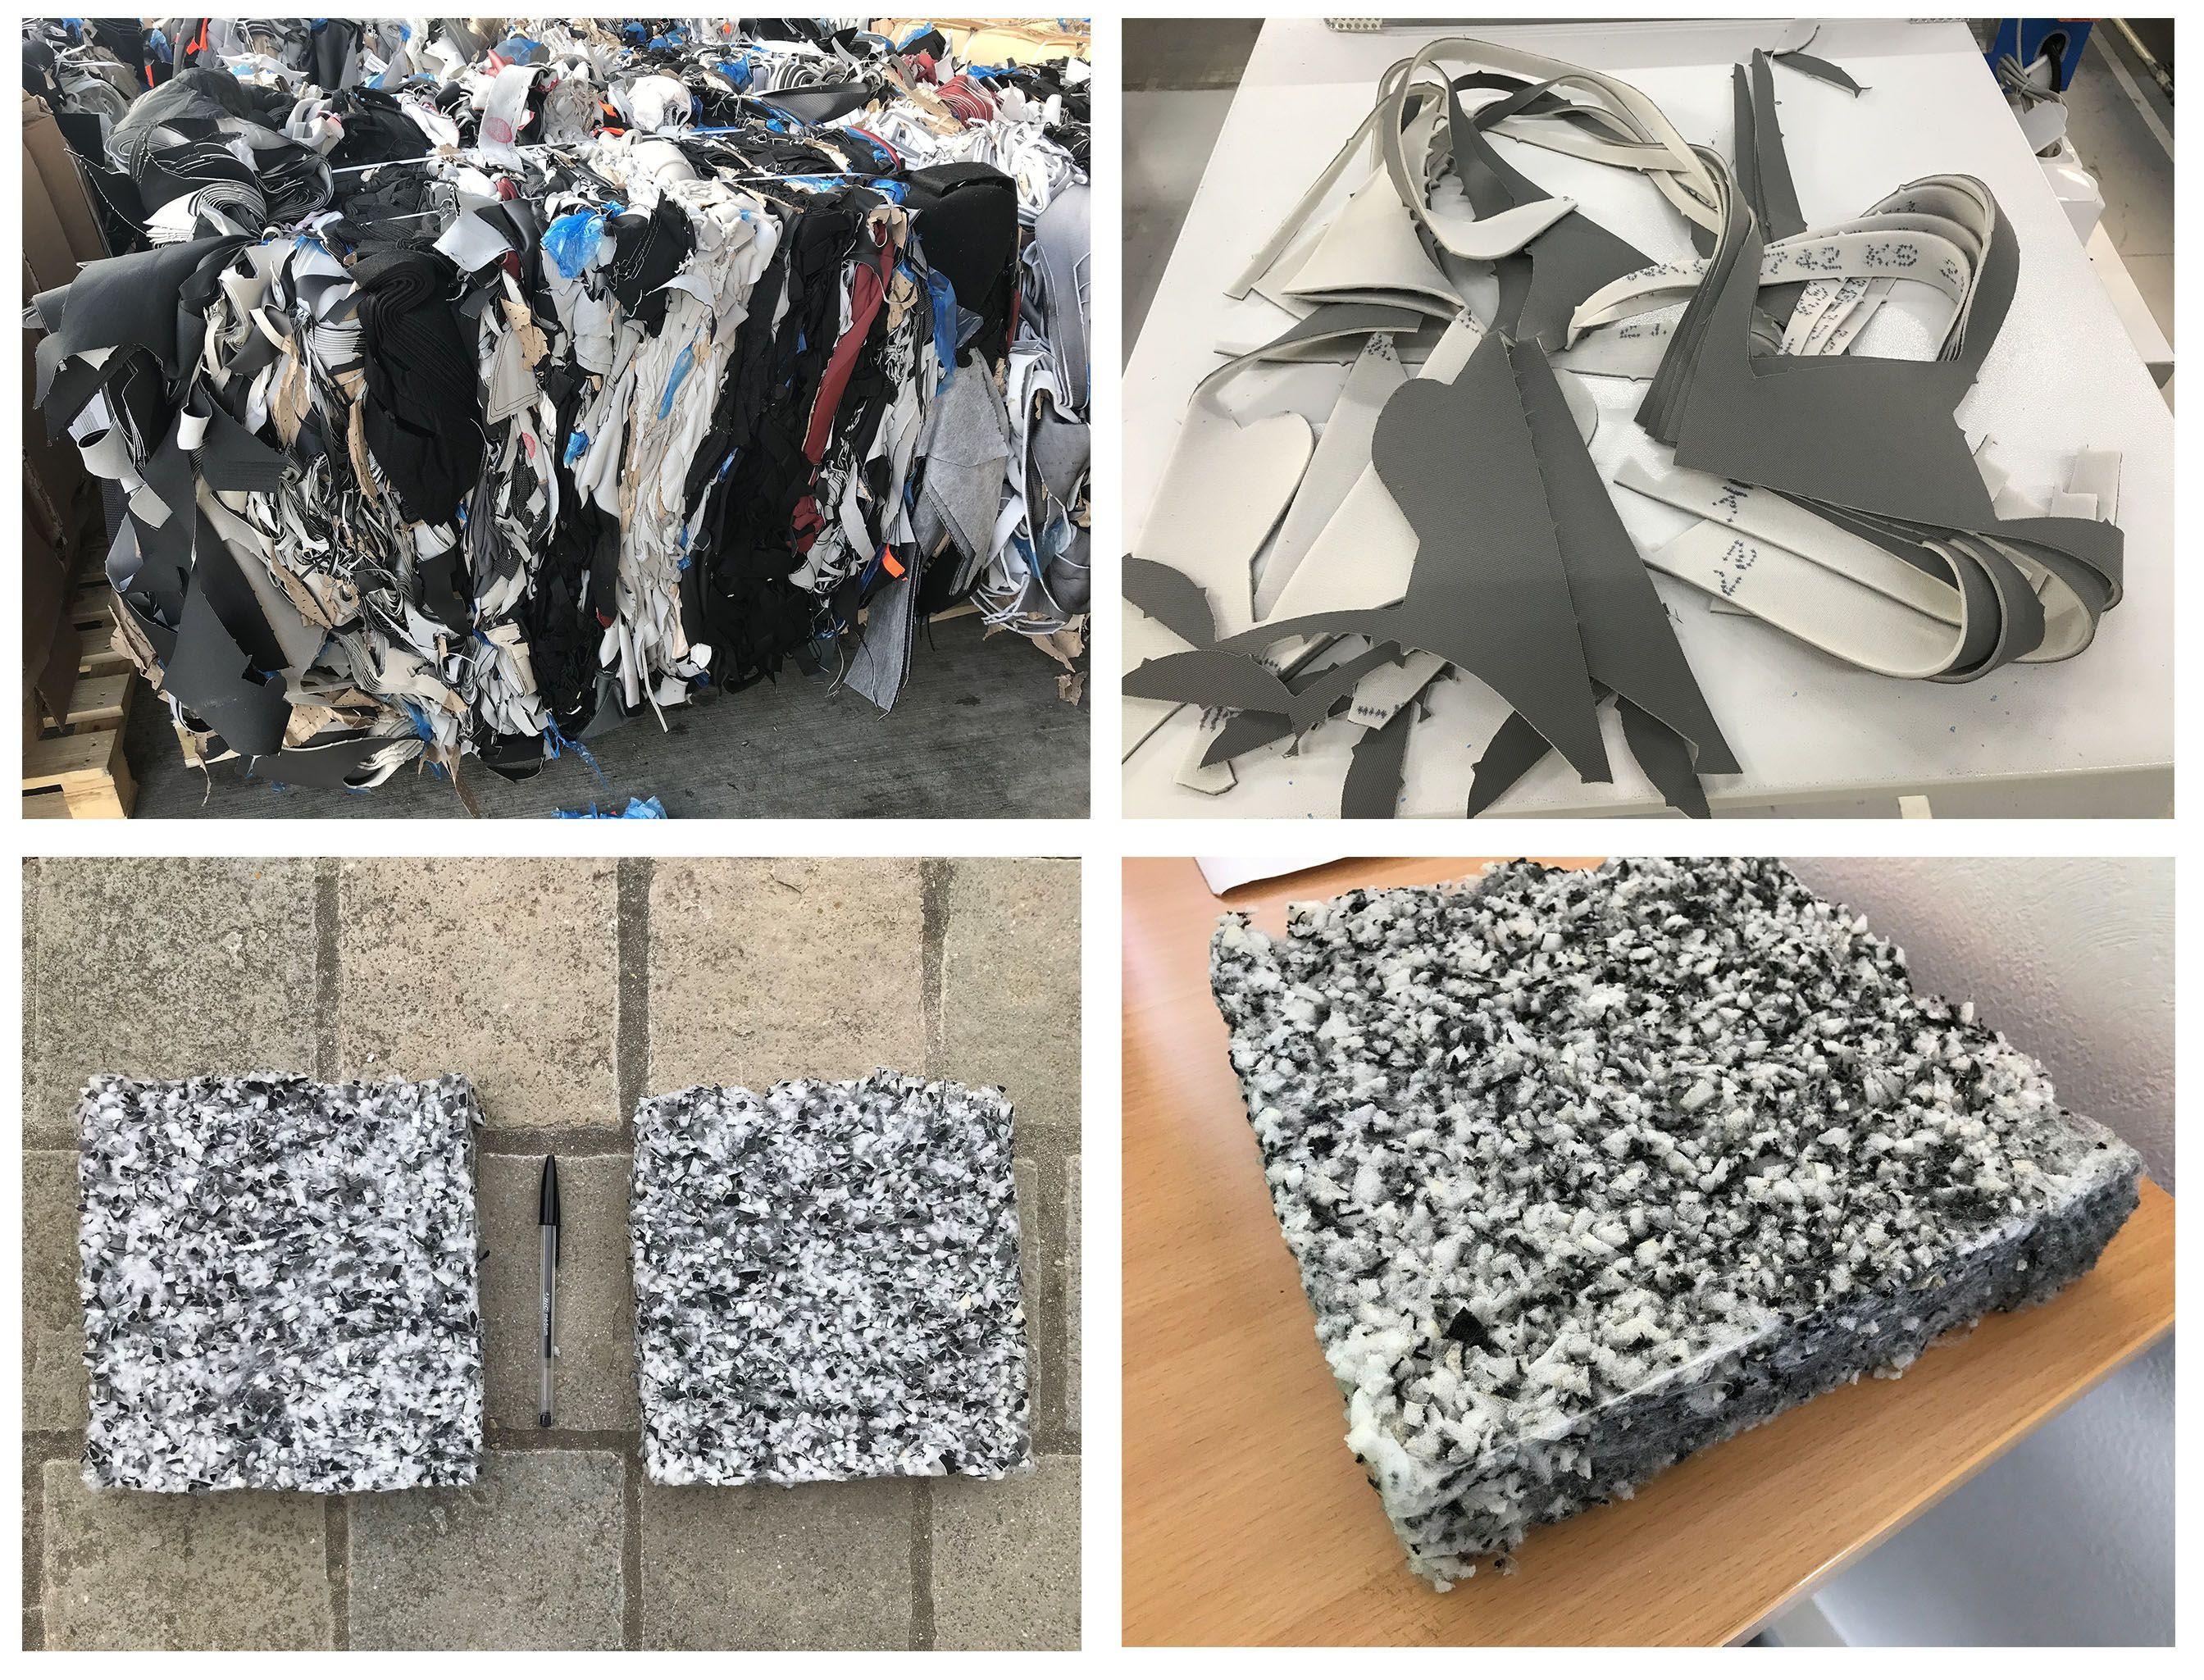 PU foamed textile waste